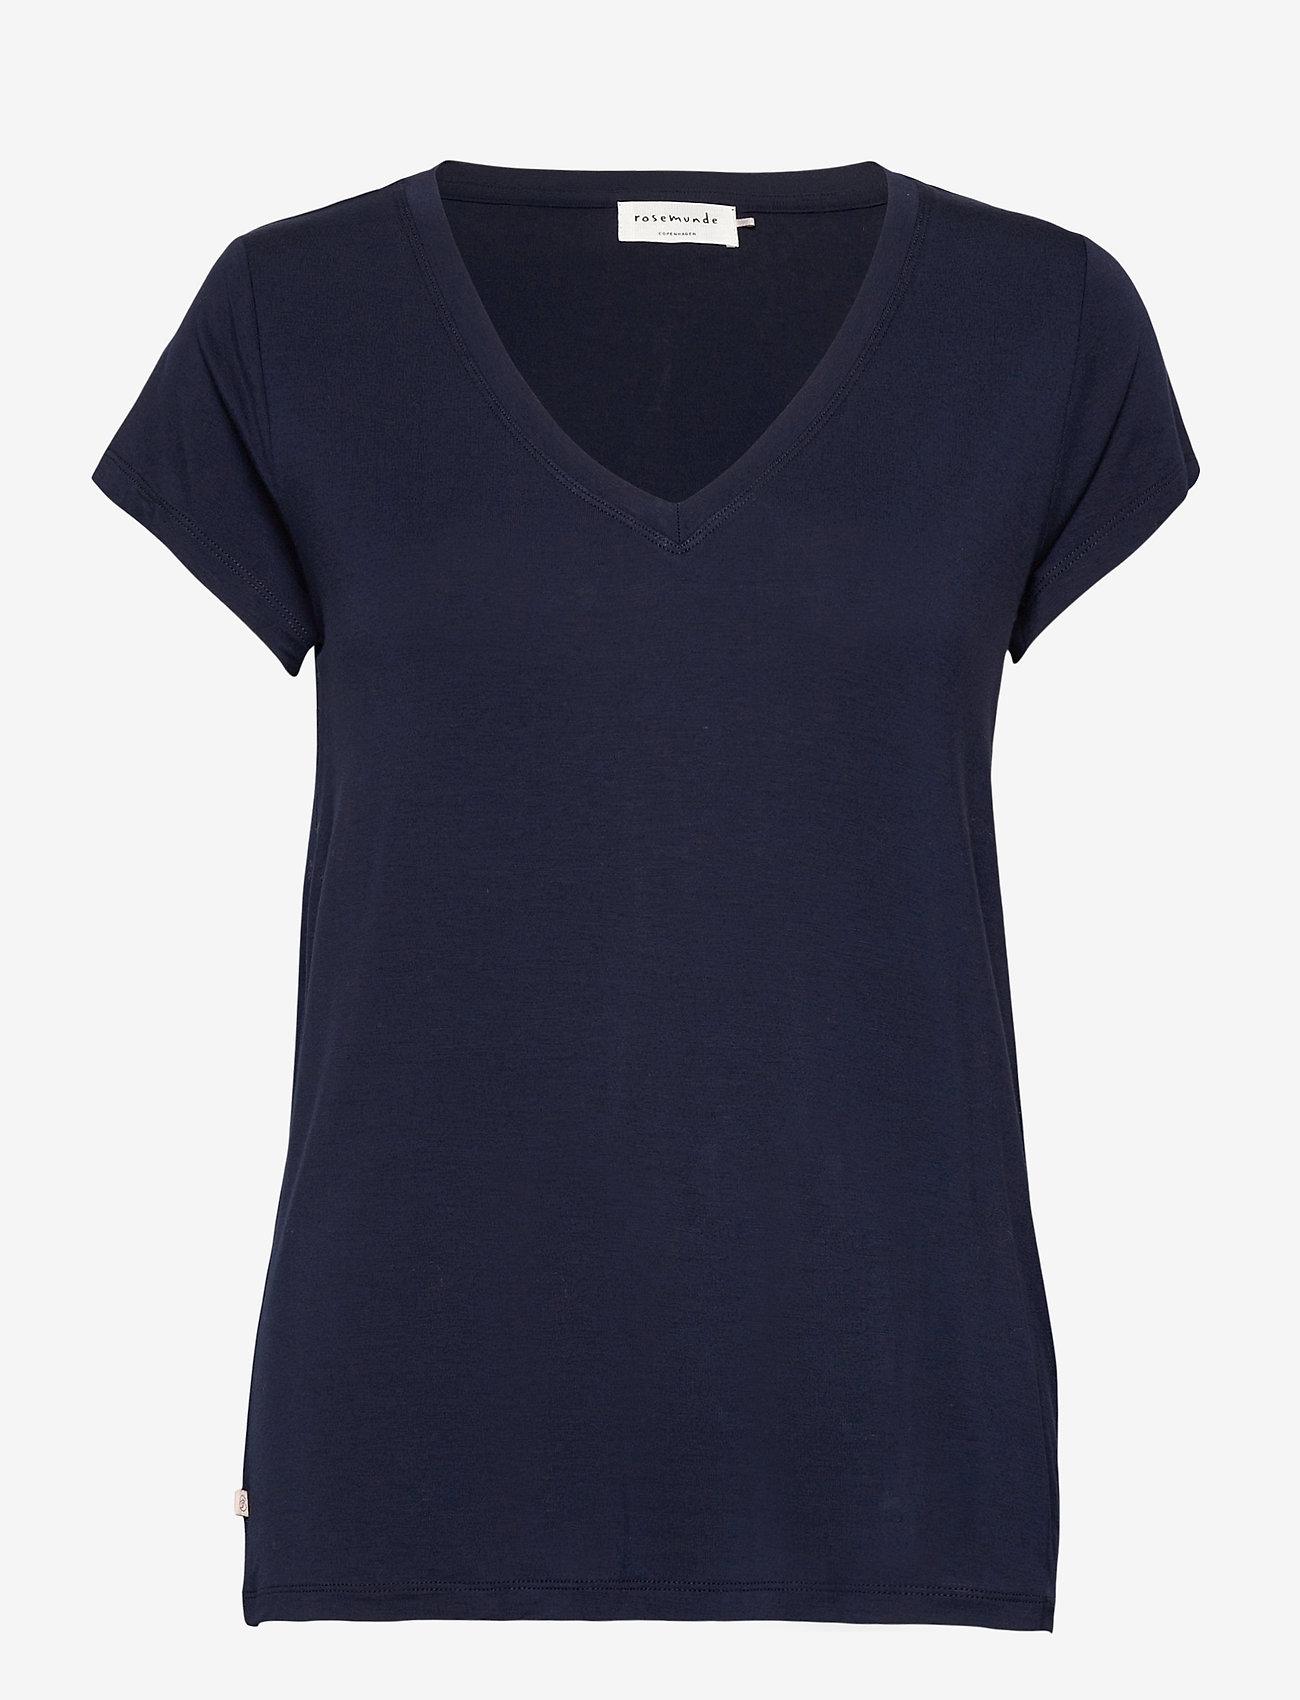 Rosemunde - T-shirt ss - t-shirts - navy - 0